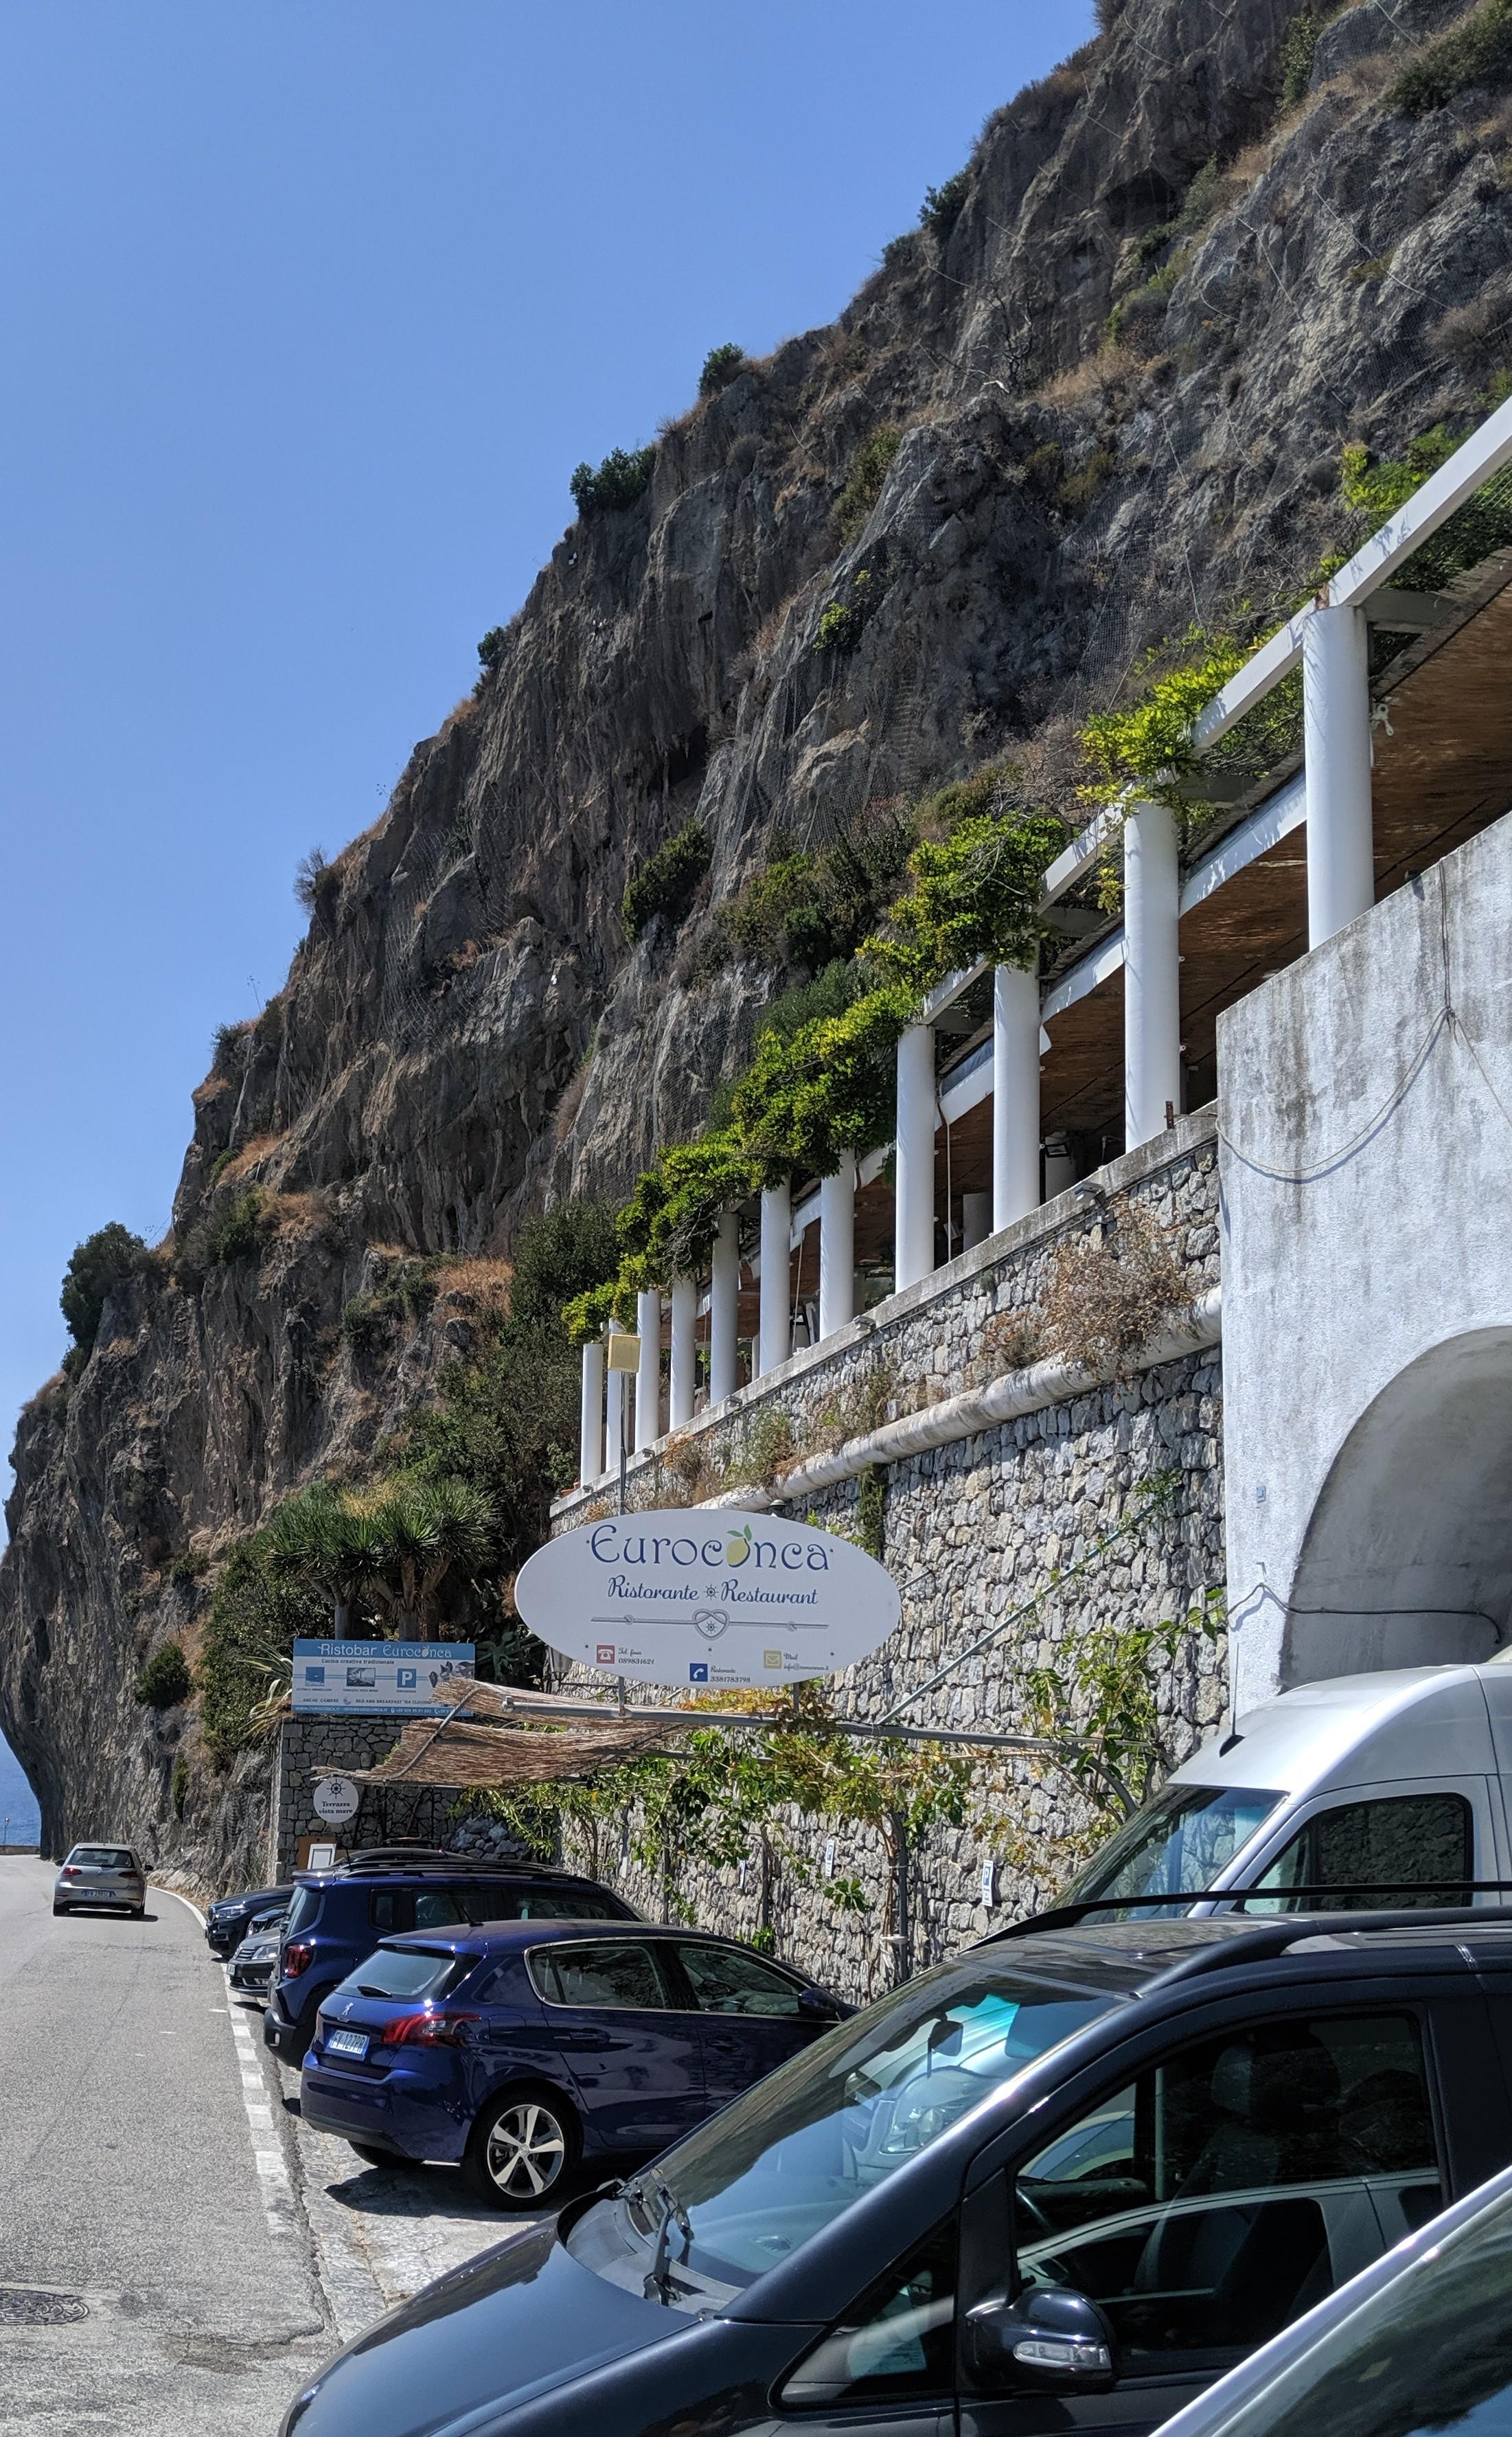 Day Trip Naples to Amalfi